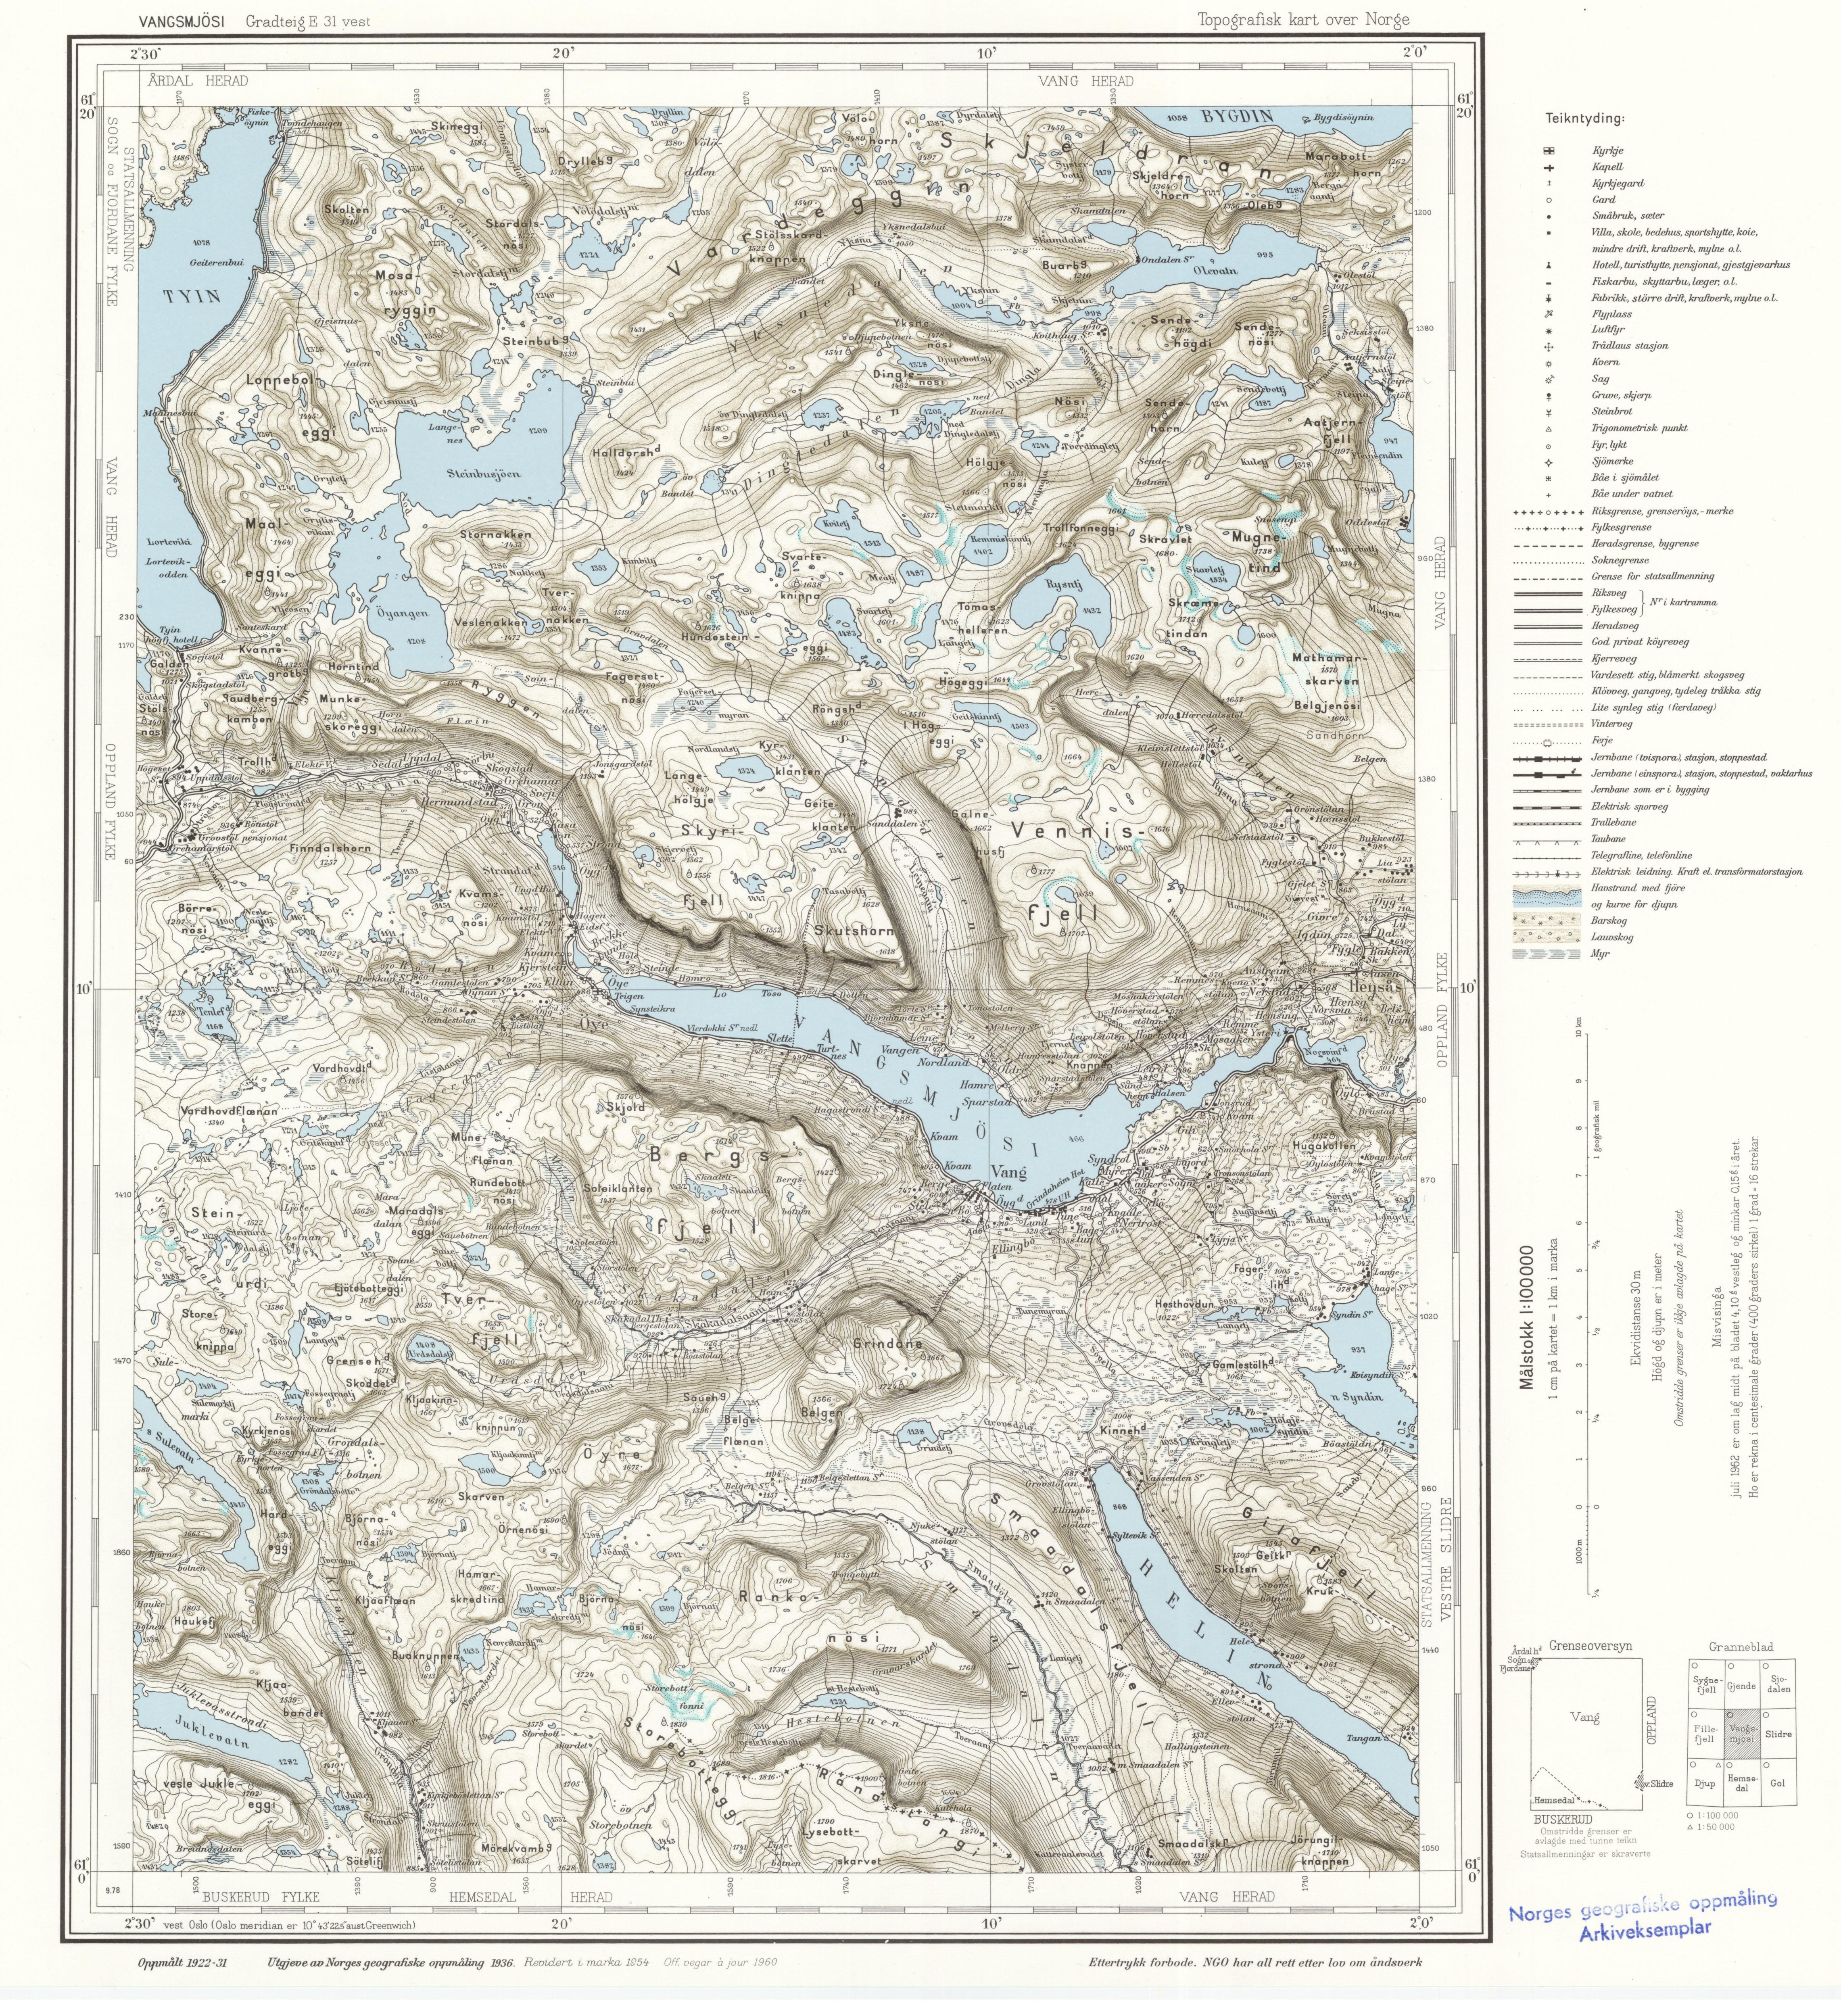 Topographic Map Of Norway.File Topographic Map Of Norway E31 Vest Vangsmjosi 1960 Jpg